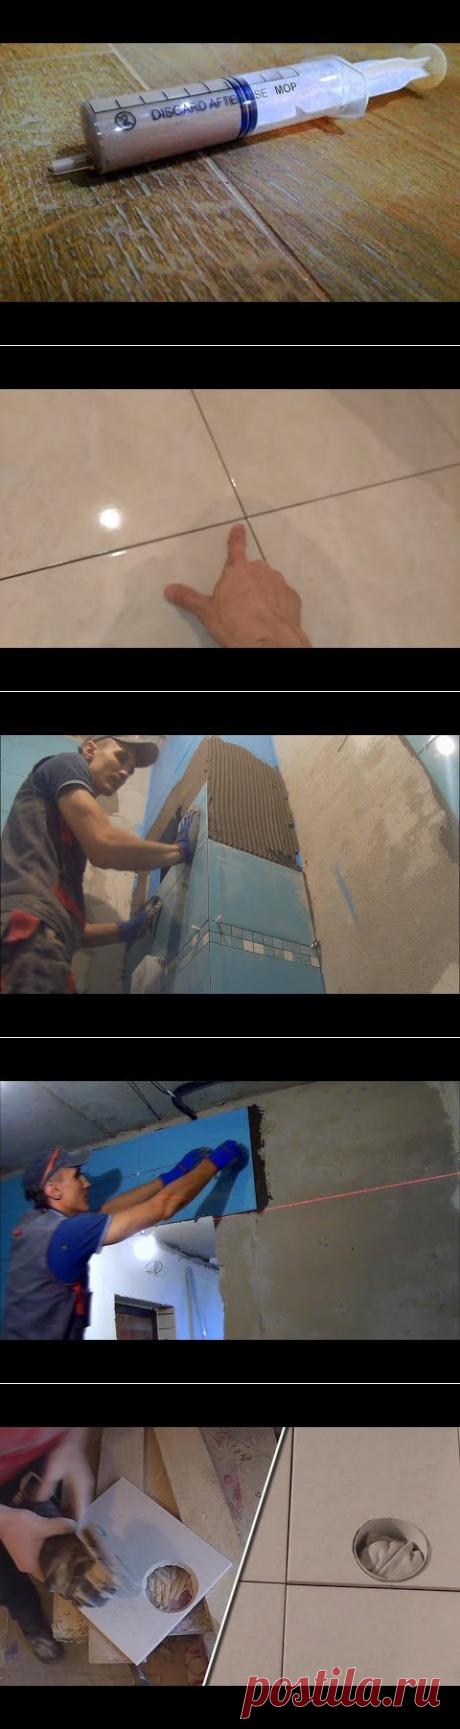 Рабочие хитрости ПРИ УКЛАДКЕ ПЛИТКИ !!! от 9plitok - YouTube